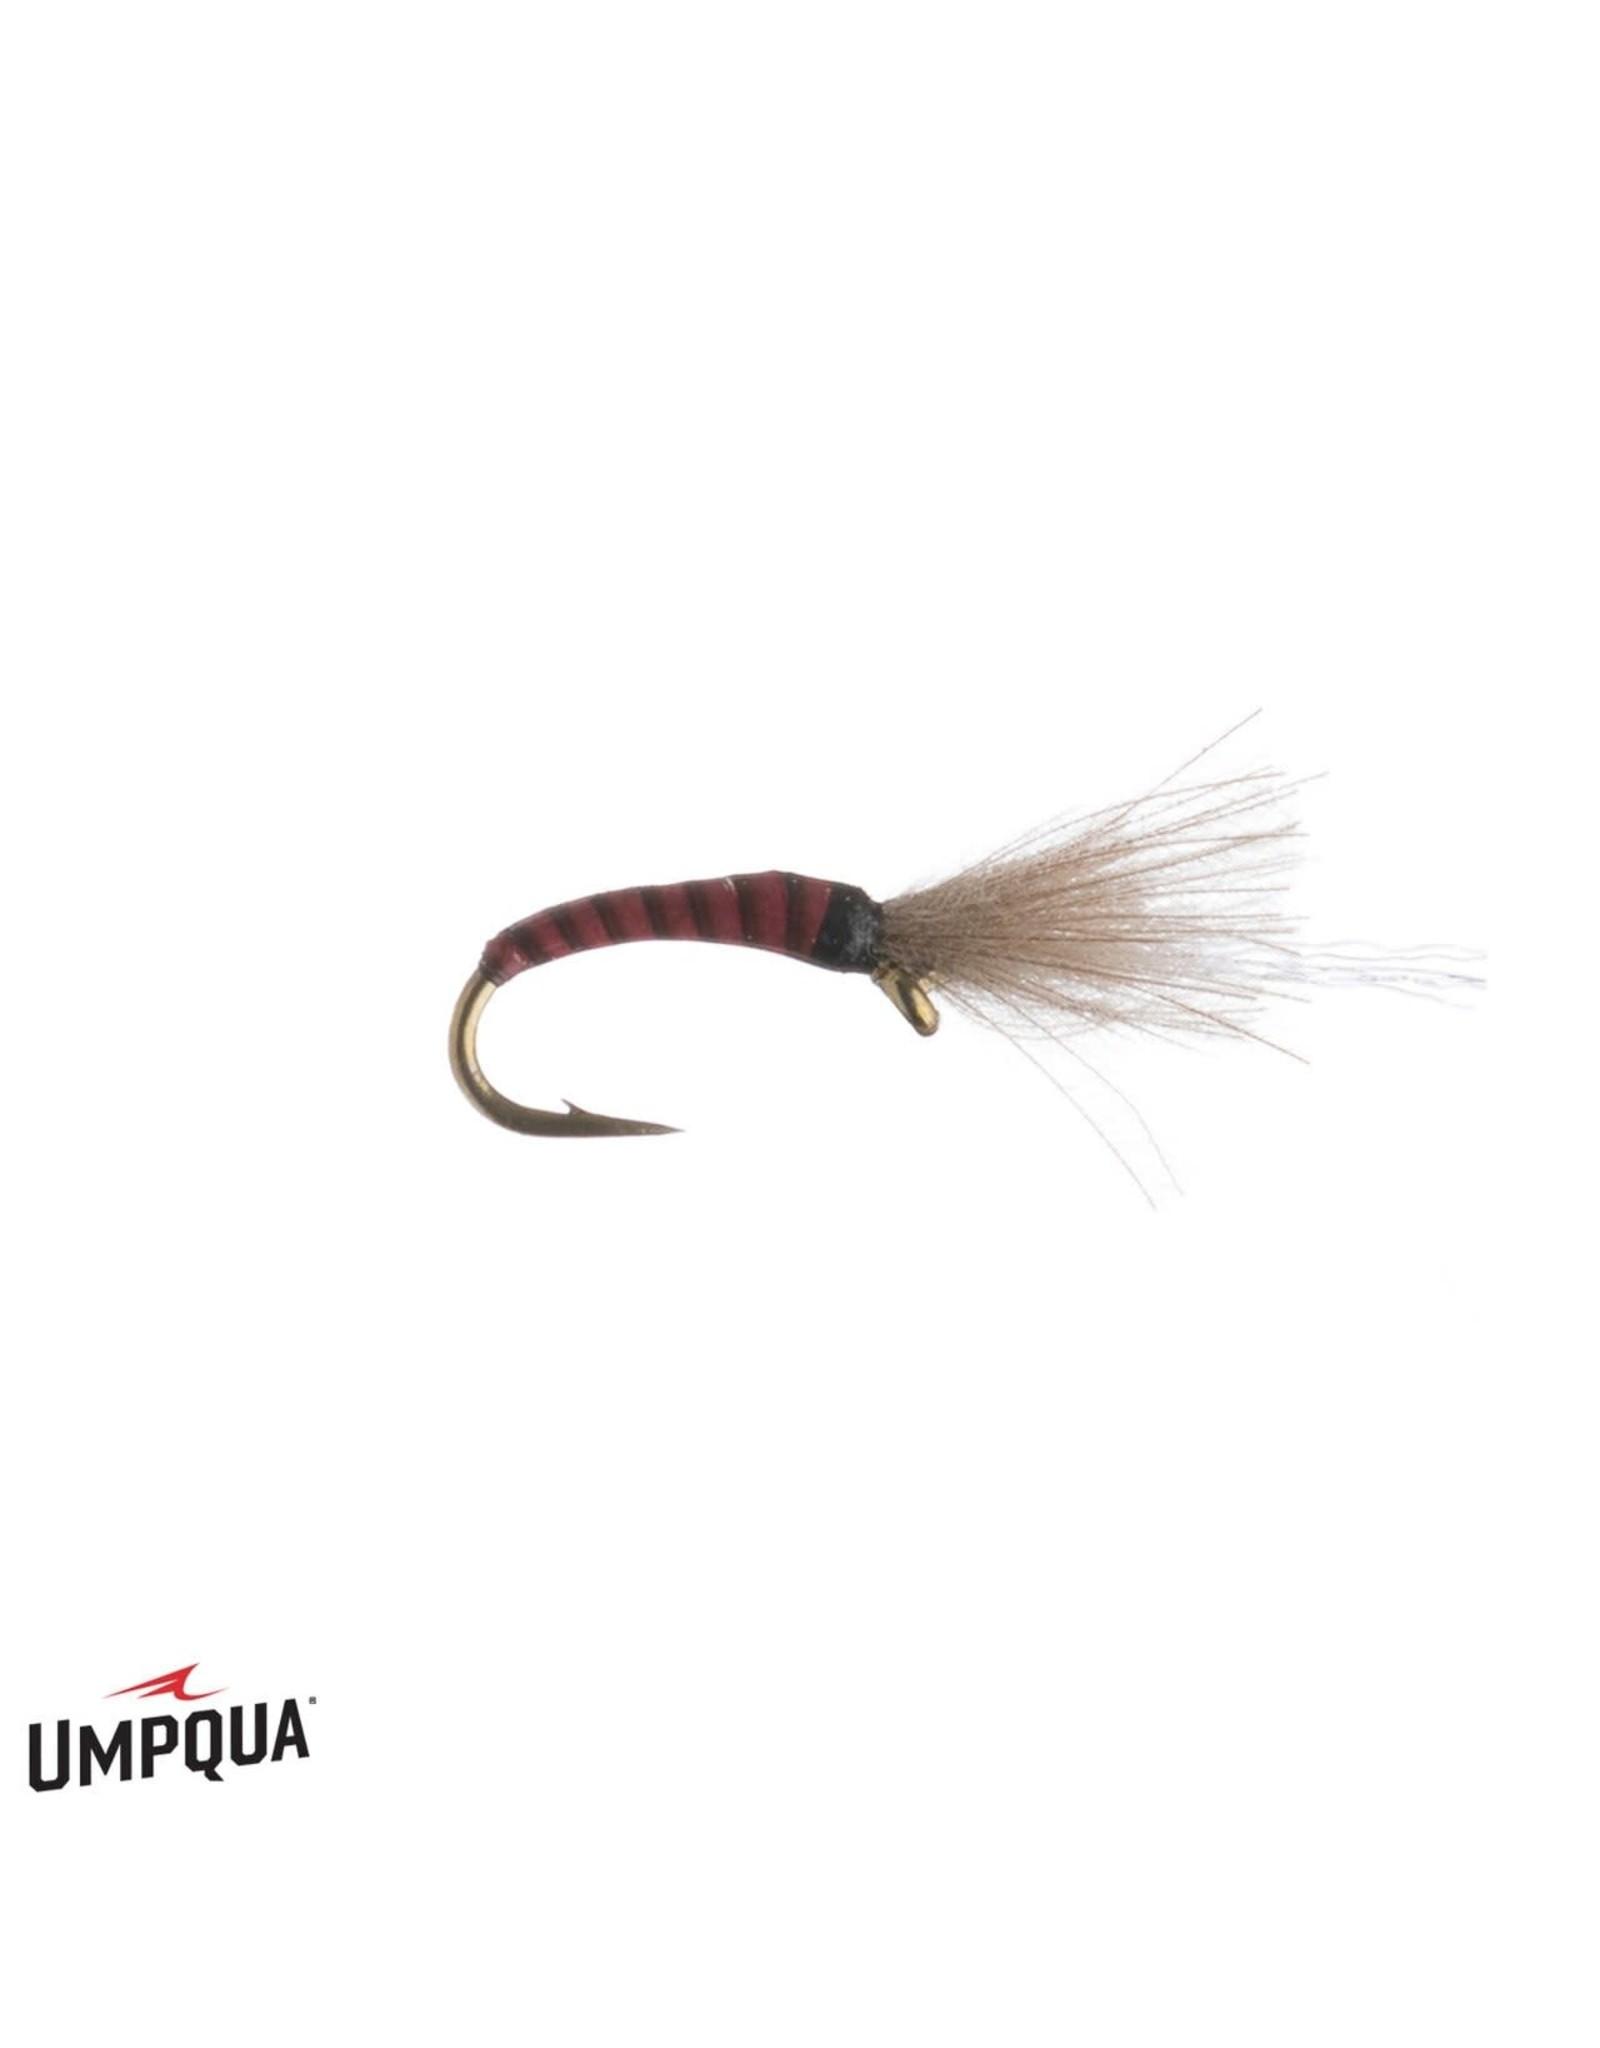 Umpqua Craven's Mole Midge (3 Pack)